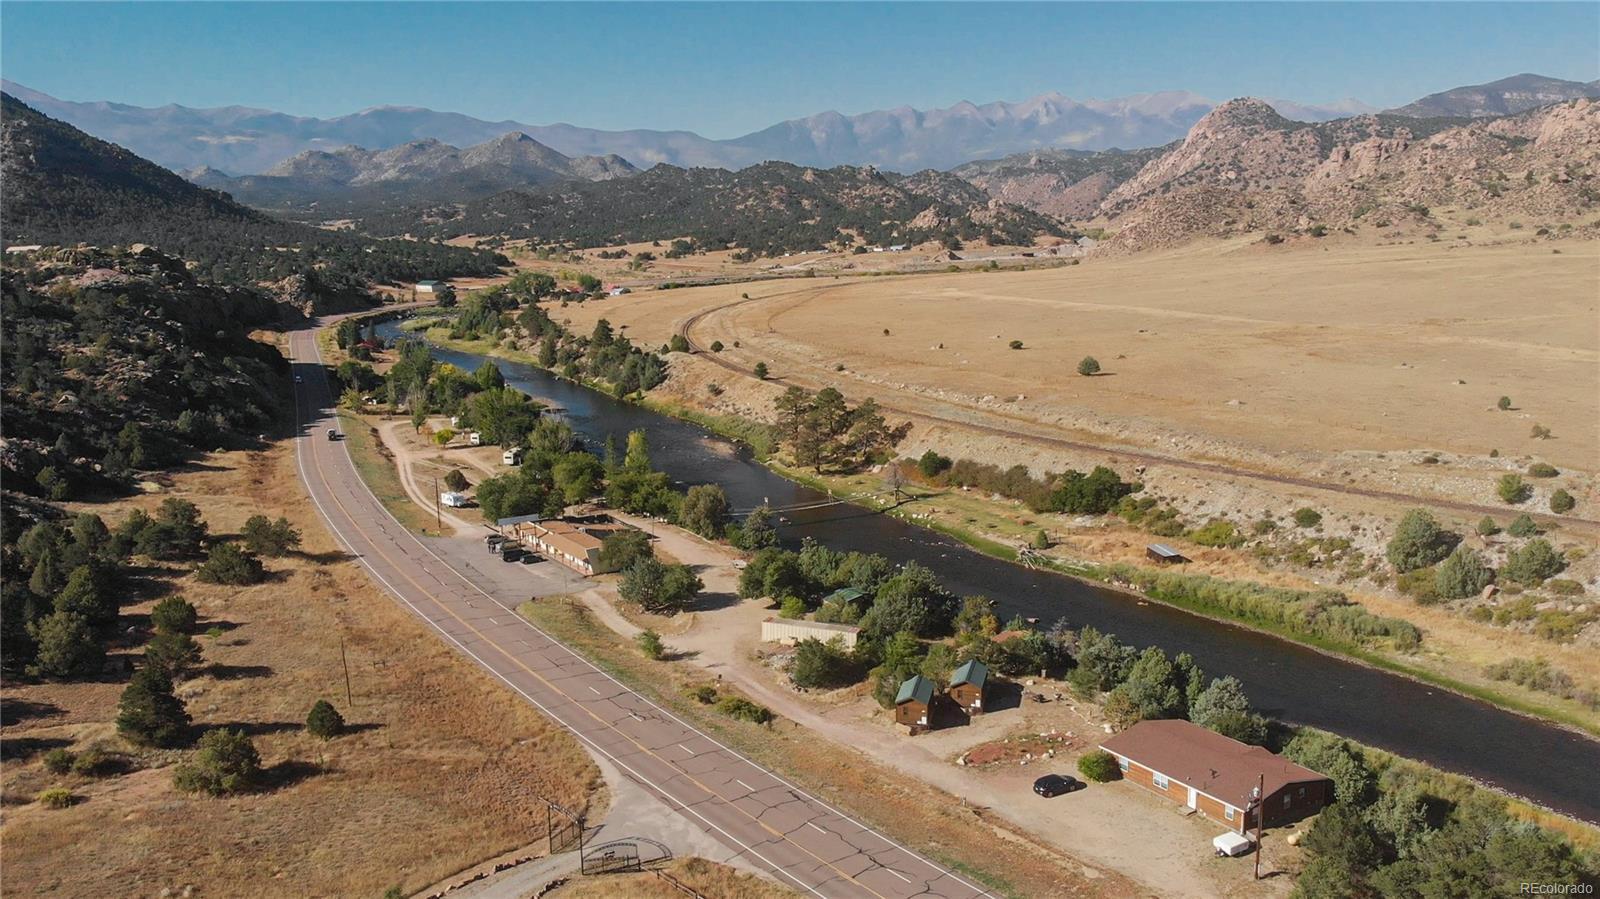 24871 Highway 50, Texas Creek, CO 81223 - Texas Creek, CO real estate listing